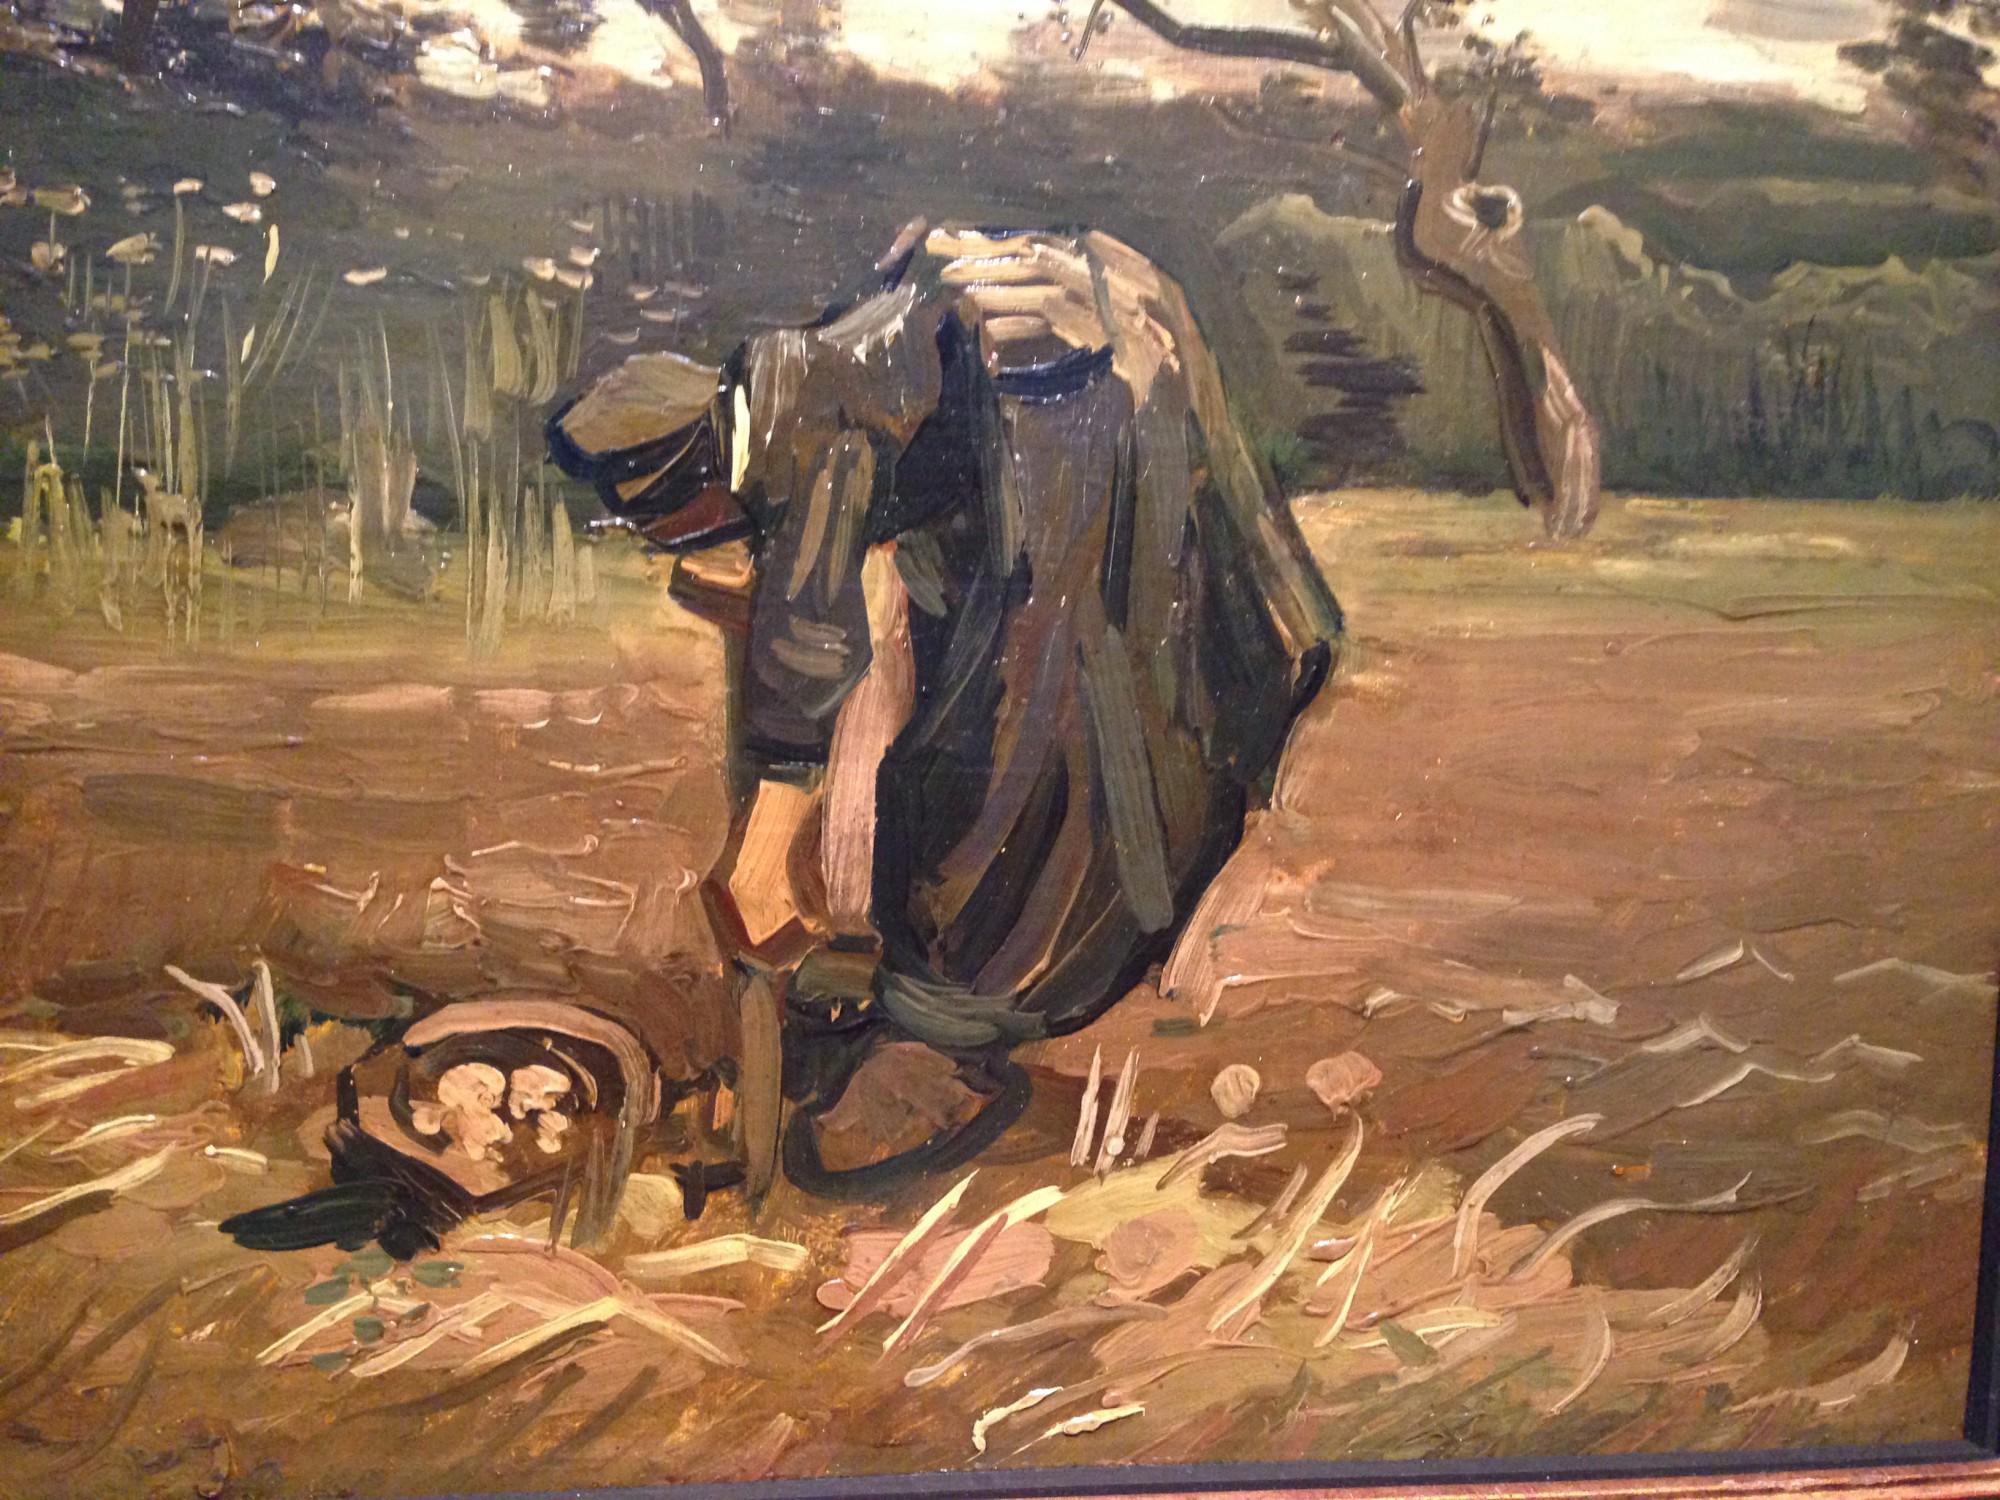 van Gogh: Frau auf dem Kartoffelacker